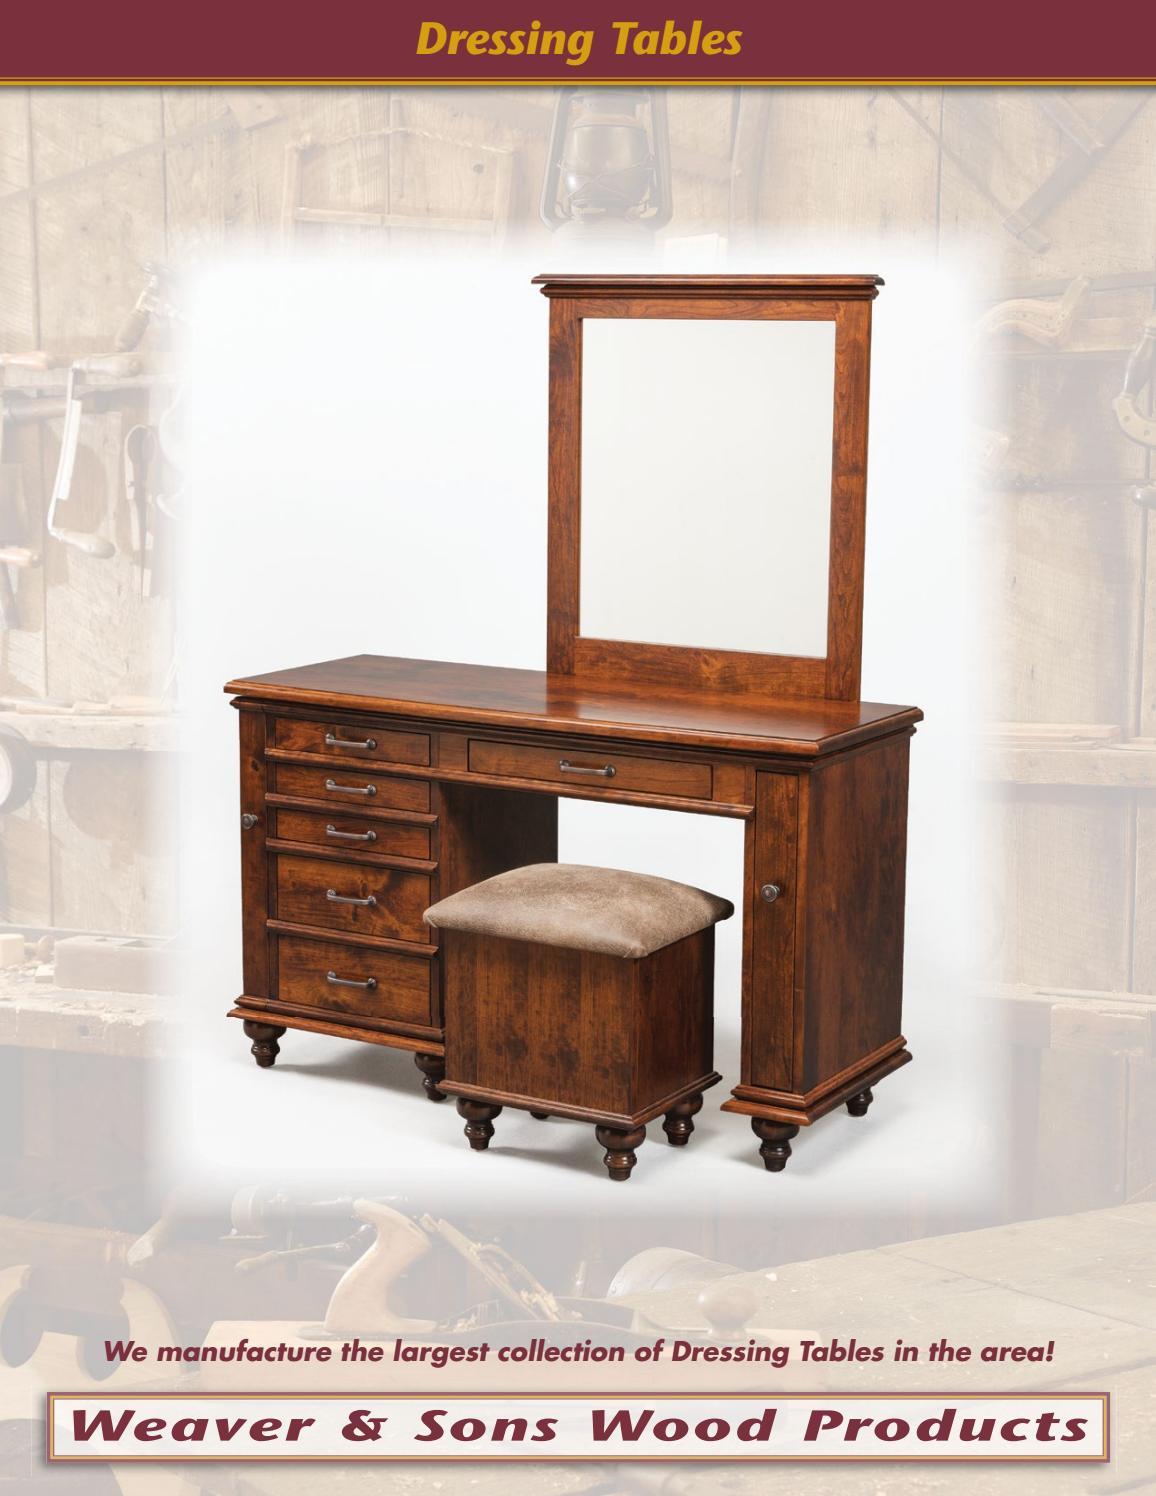 2016 Weaver U0026 Sons Wood Products Catalog / Jewelry Boxes / E U0026 G Amish  Furniture By E U0026 G Amish Furniture   Issuu